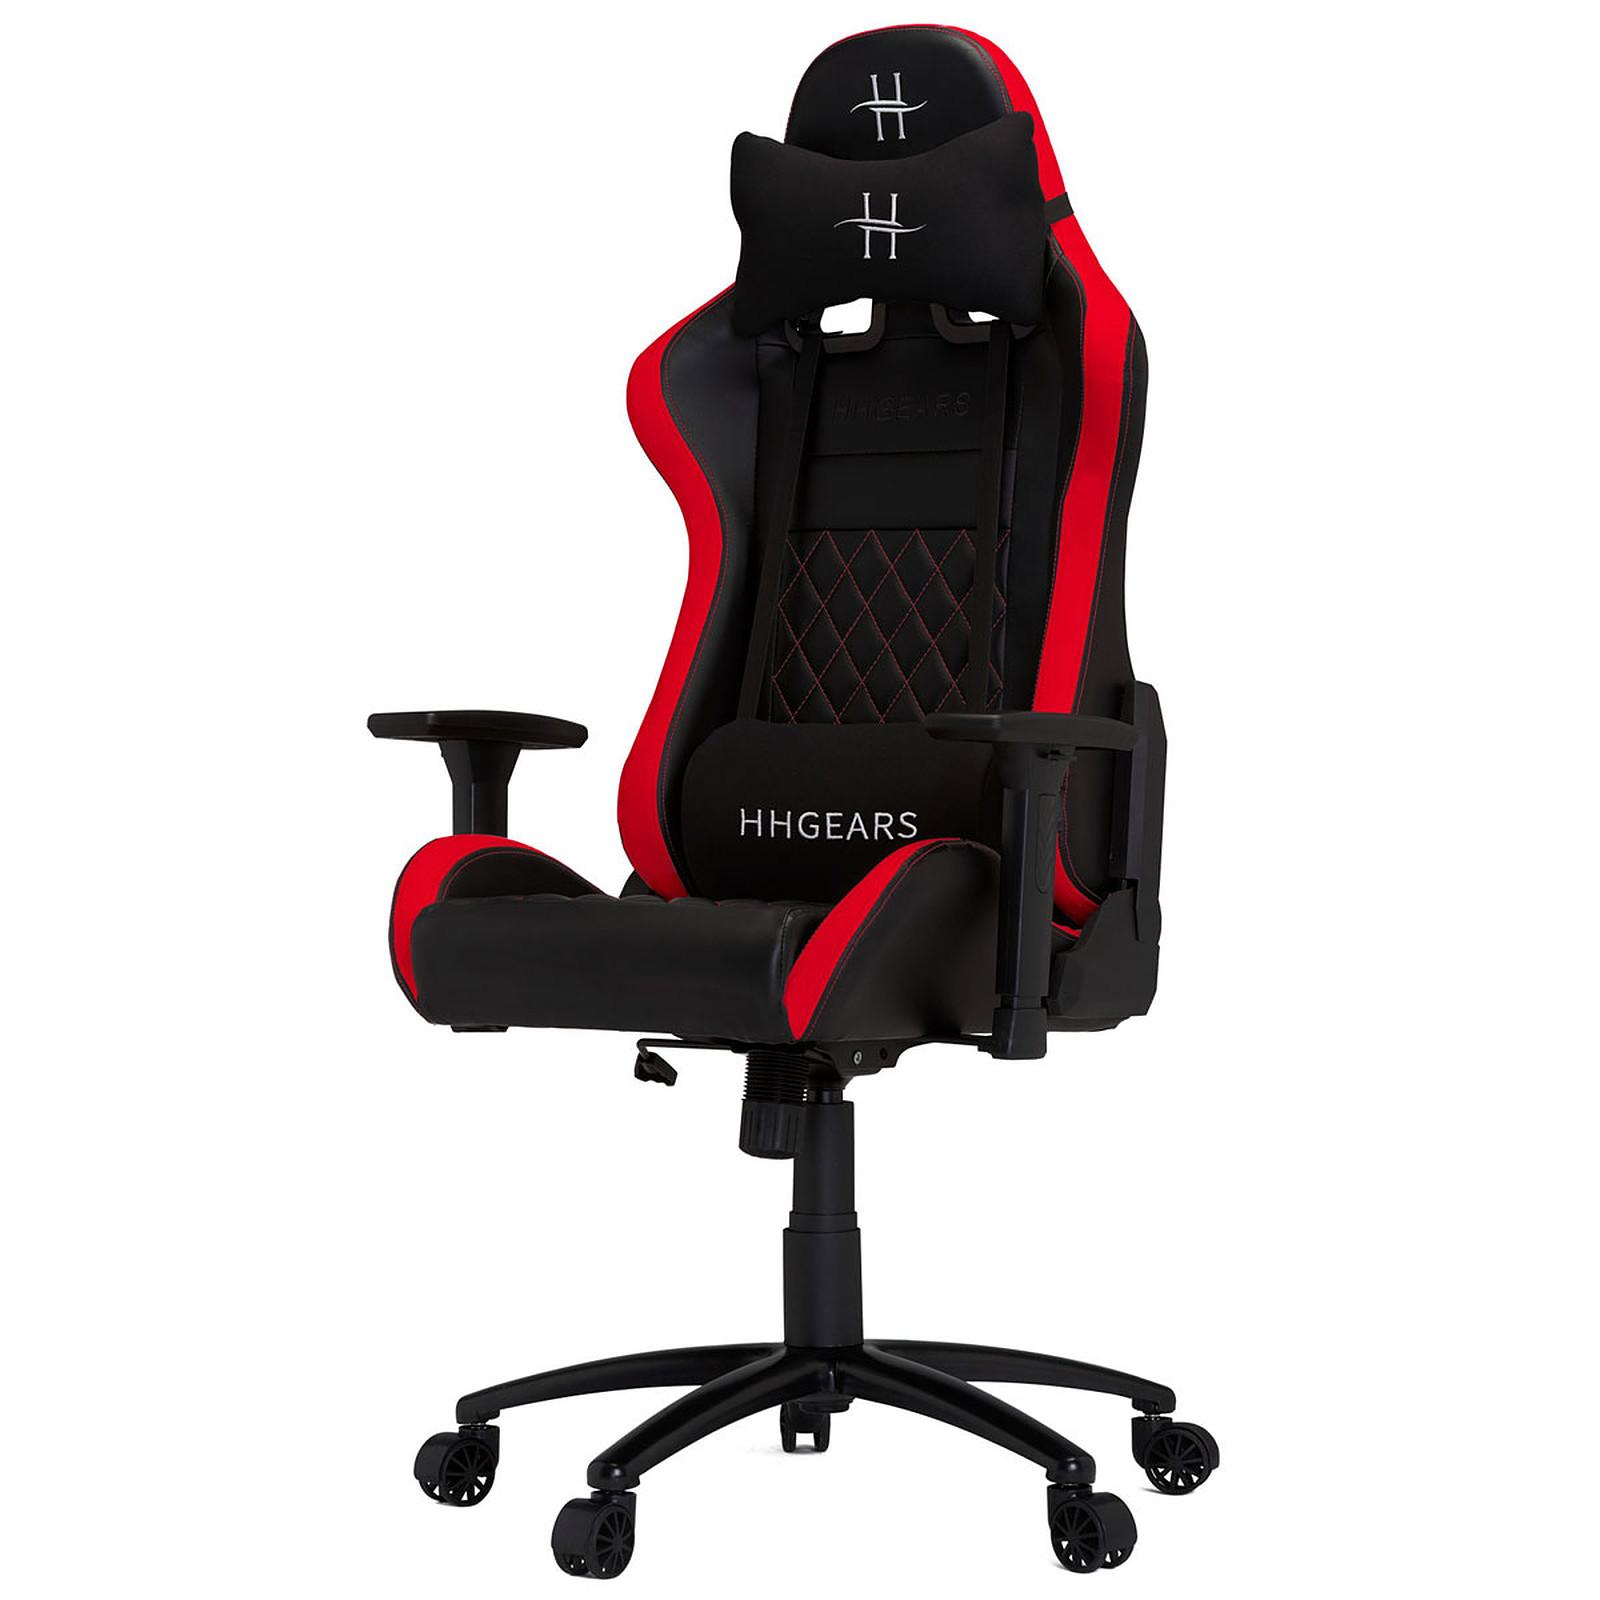 HHGears XL-500 Rouge